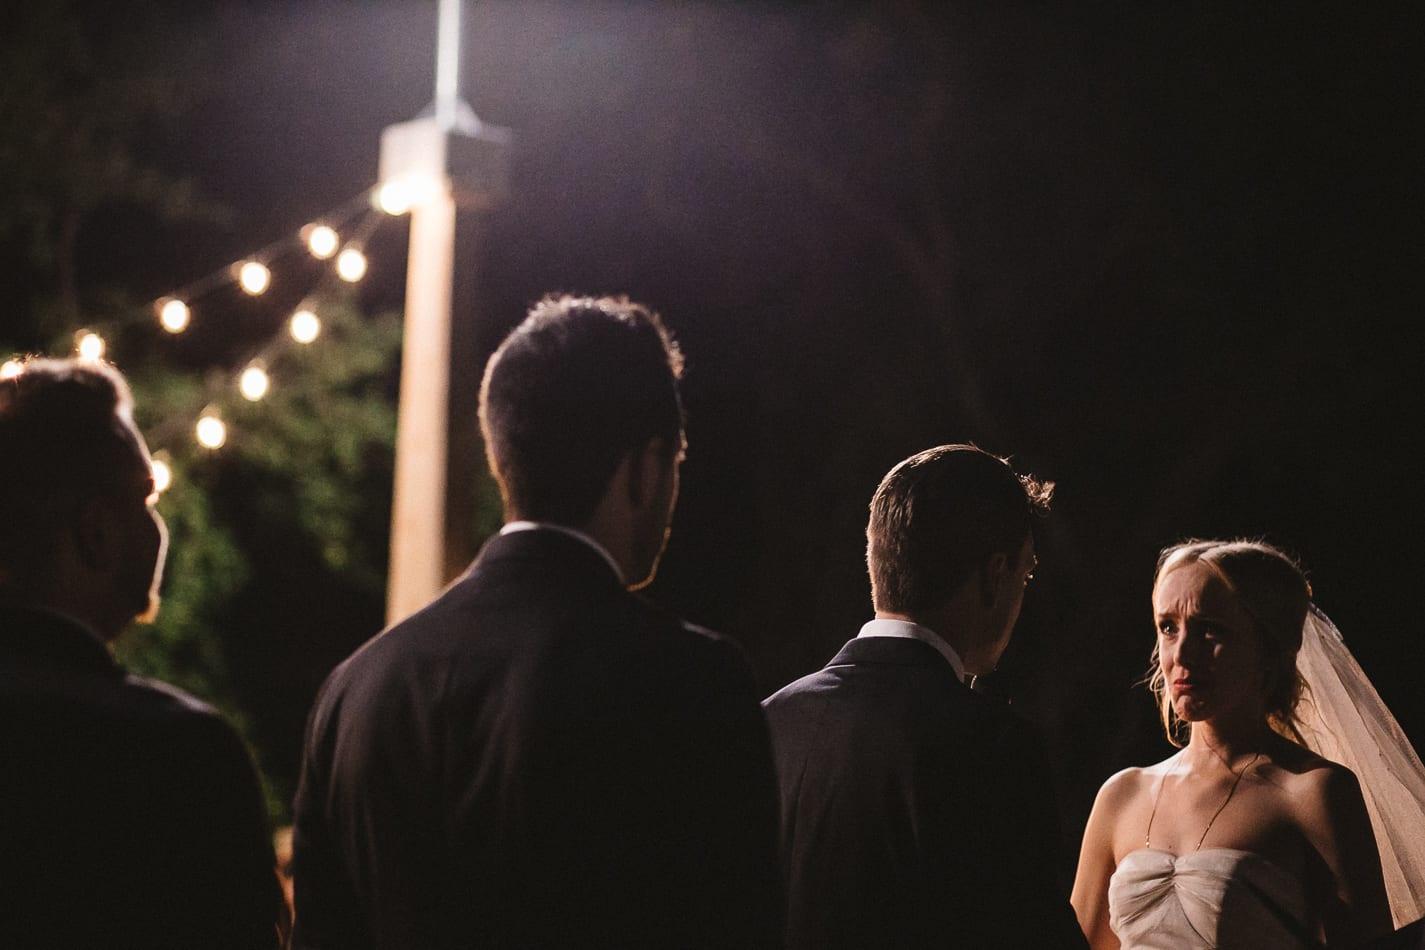 lake-redding-park-diesel-horse-bridge-view202-california-wedding-photographer-21